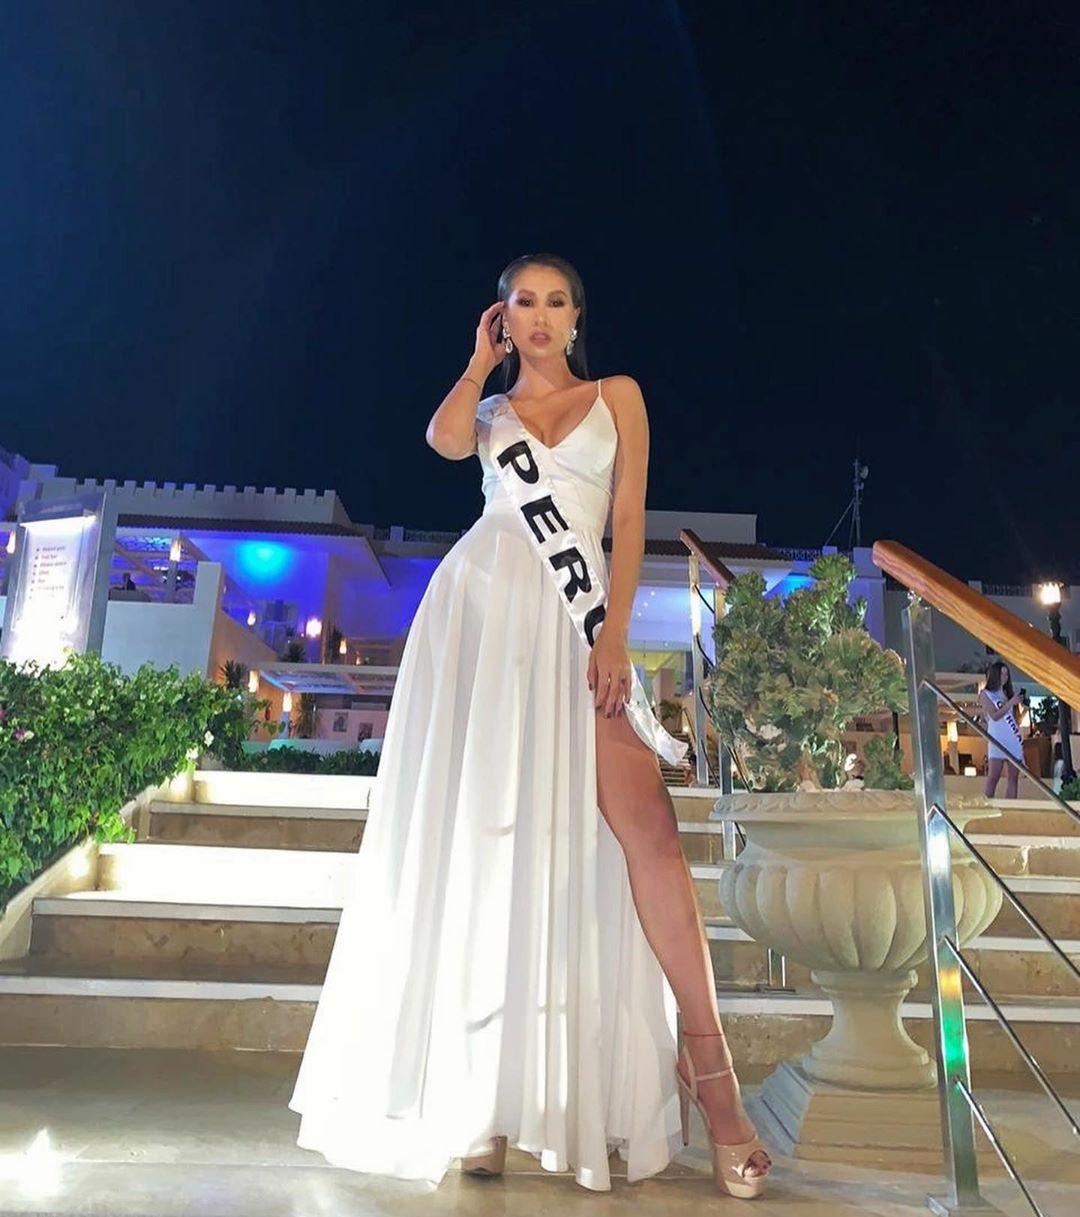 yoko chong, 4th runner-up de miss intercontinental 2019. - Página 5 79189610